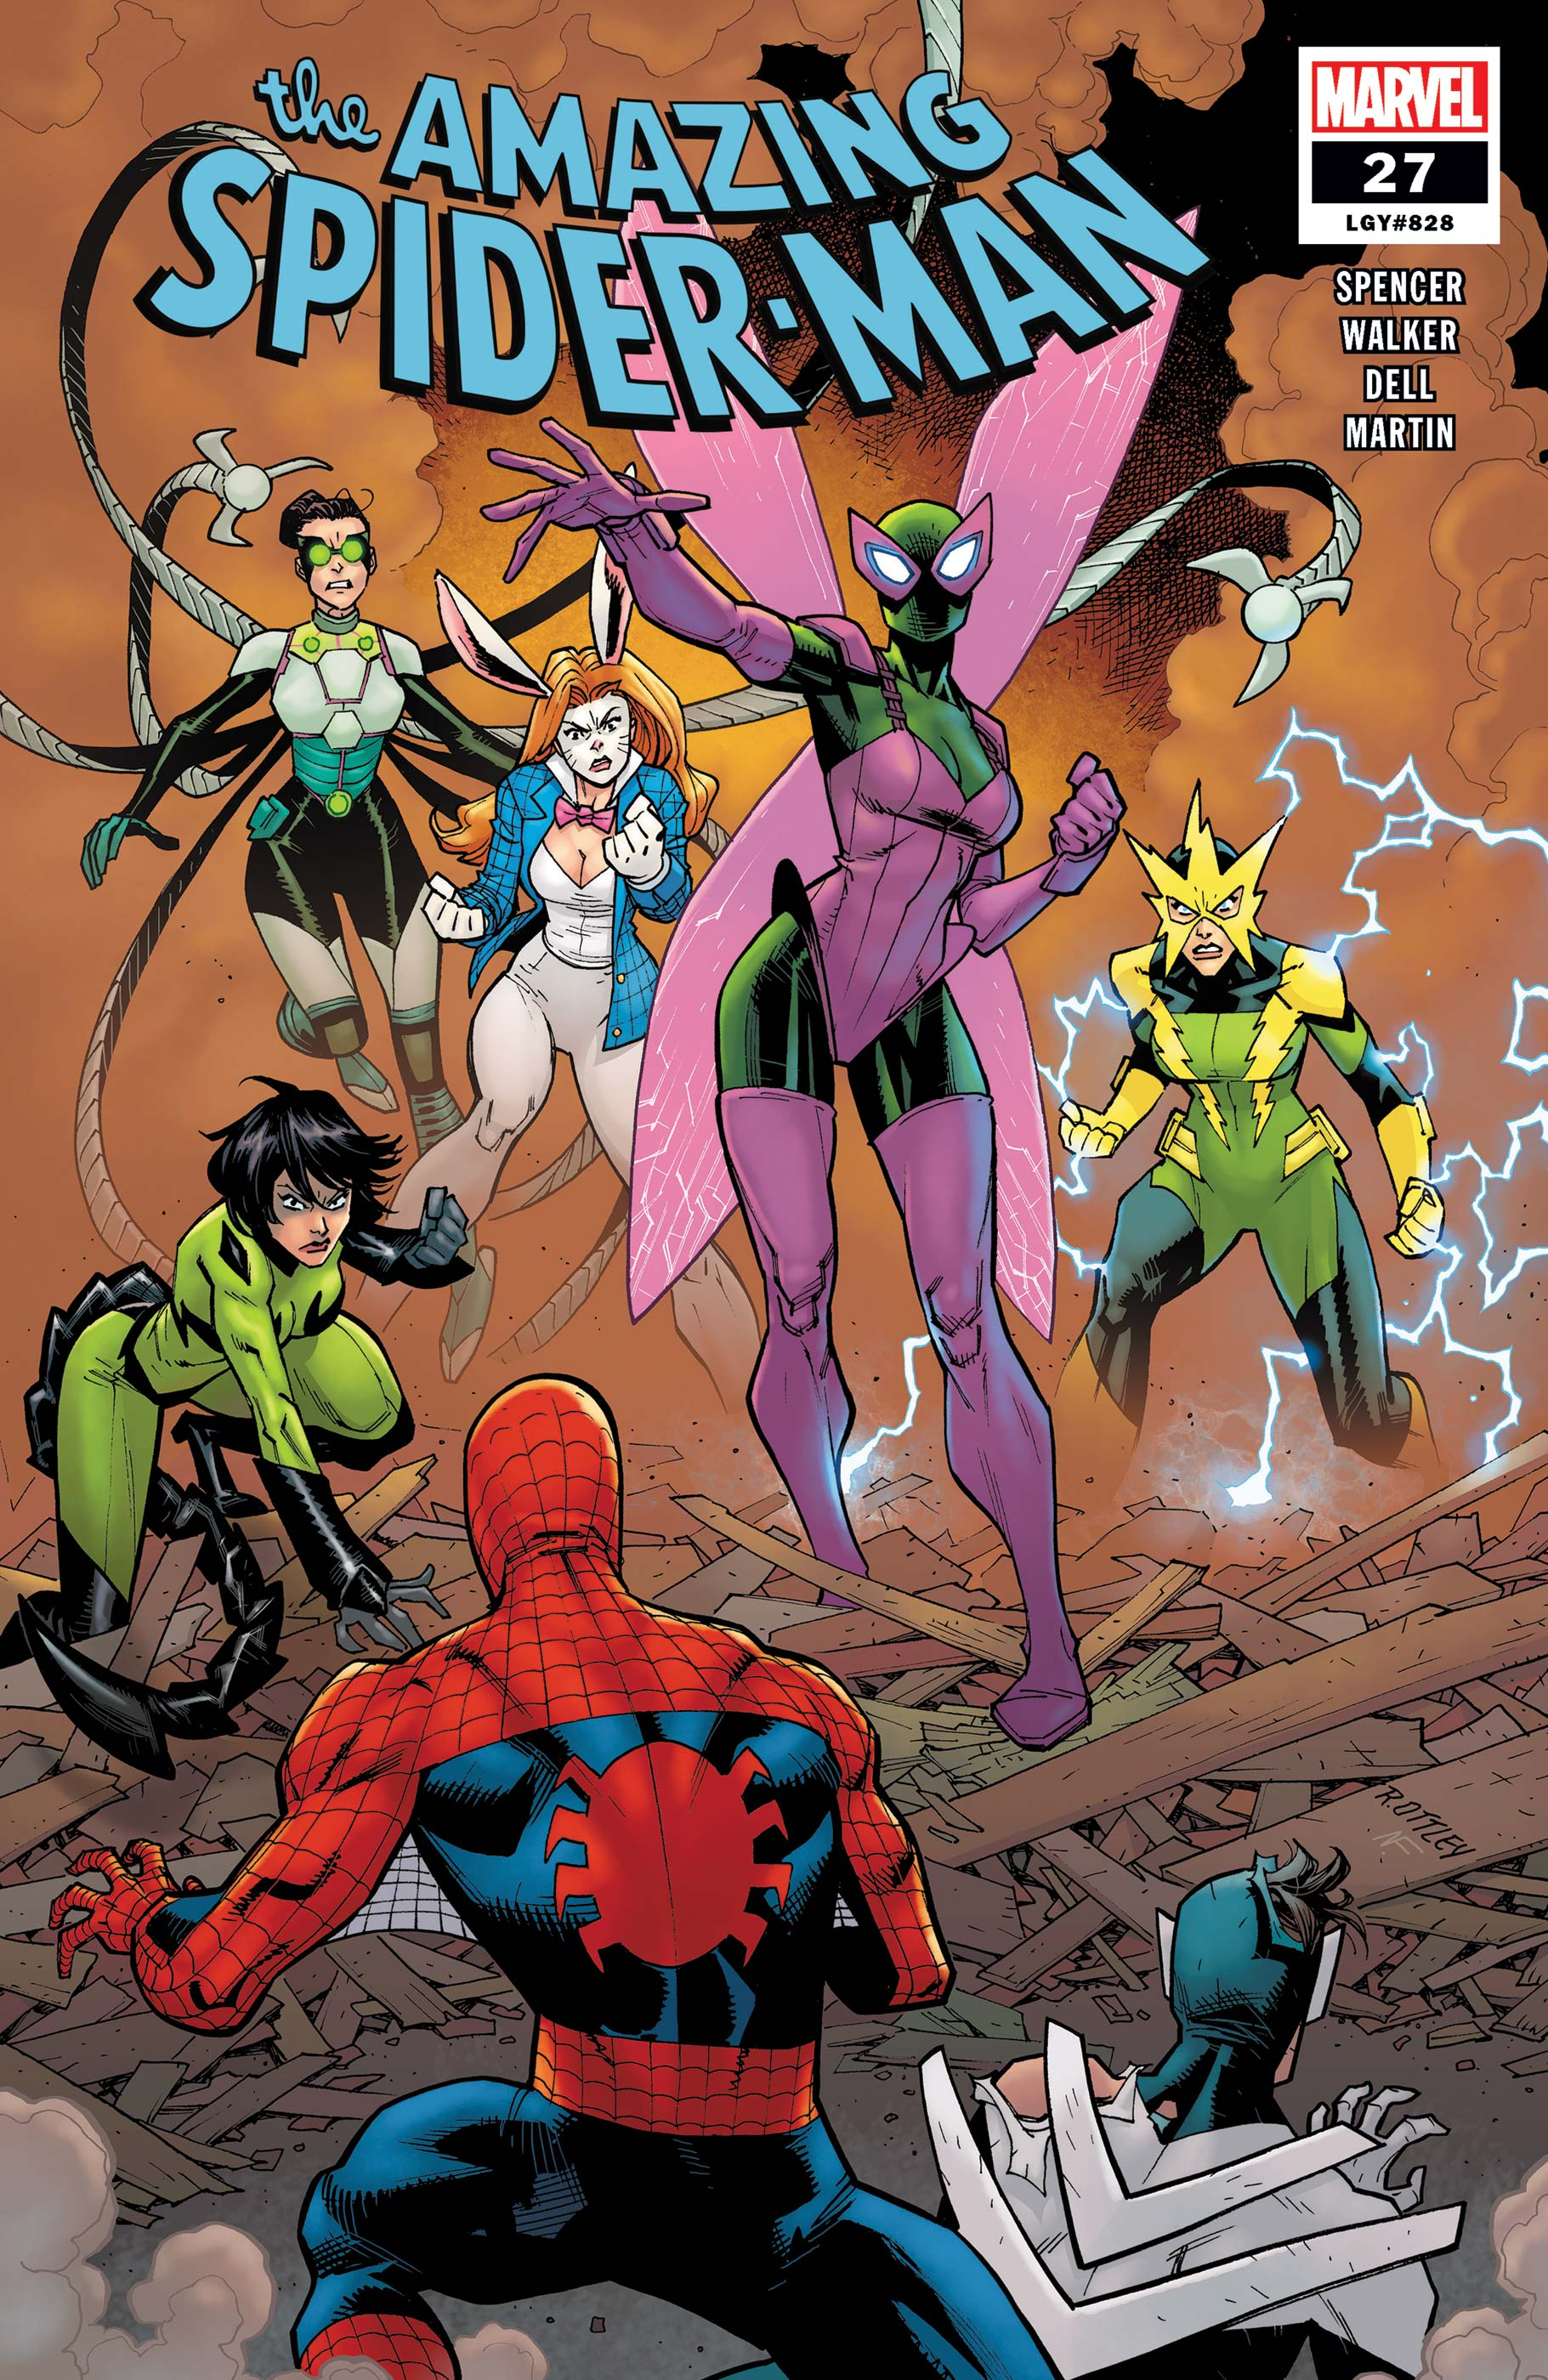 The Amazing Spider-Man (2018) #27